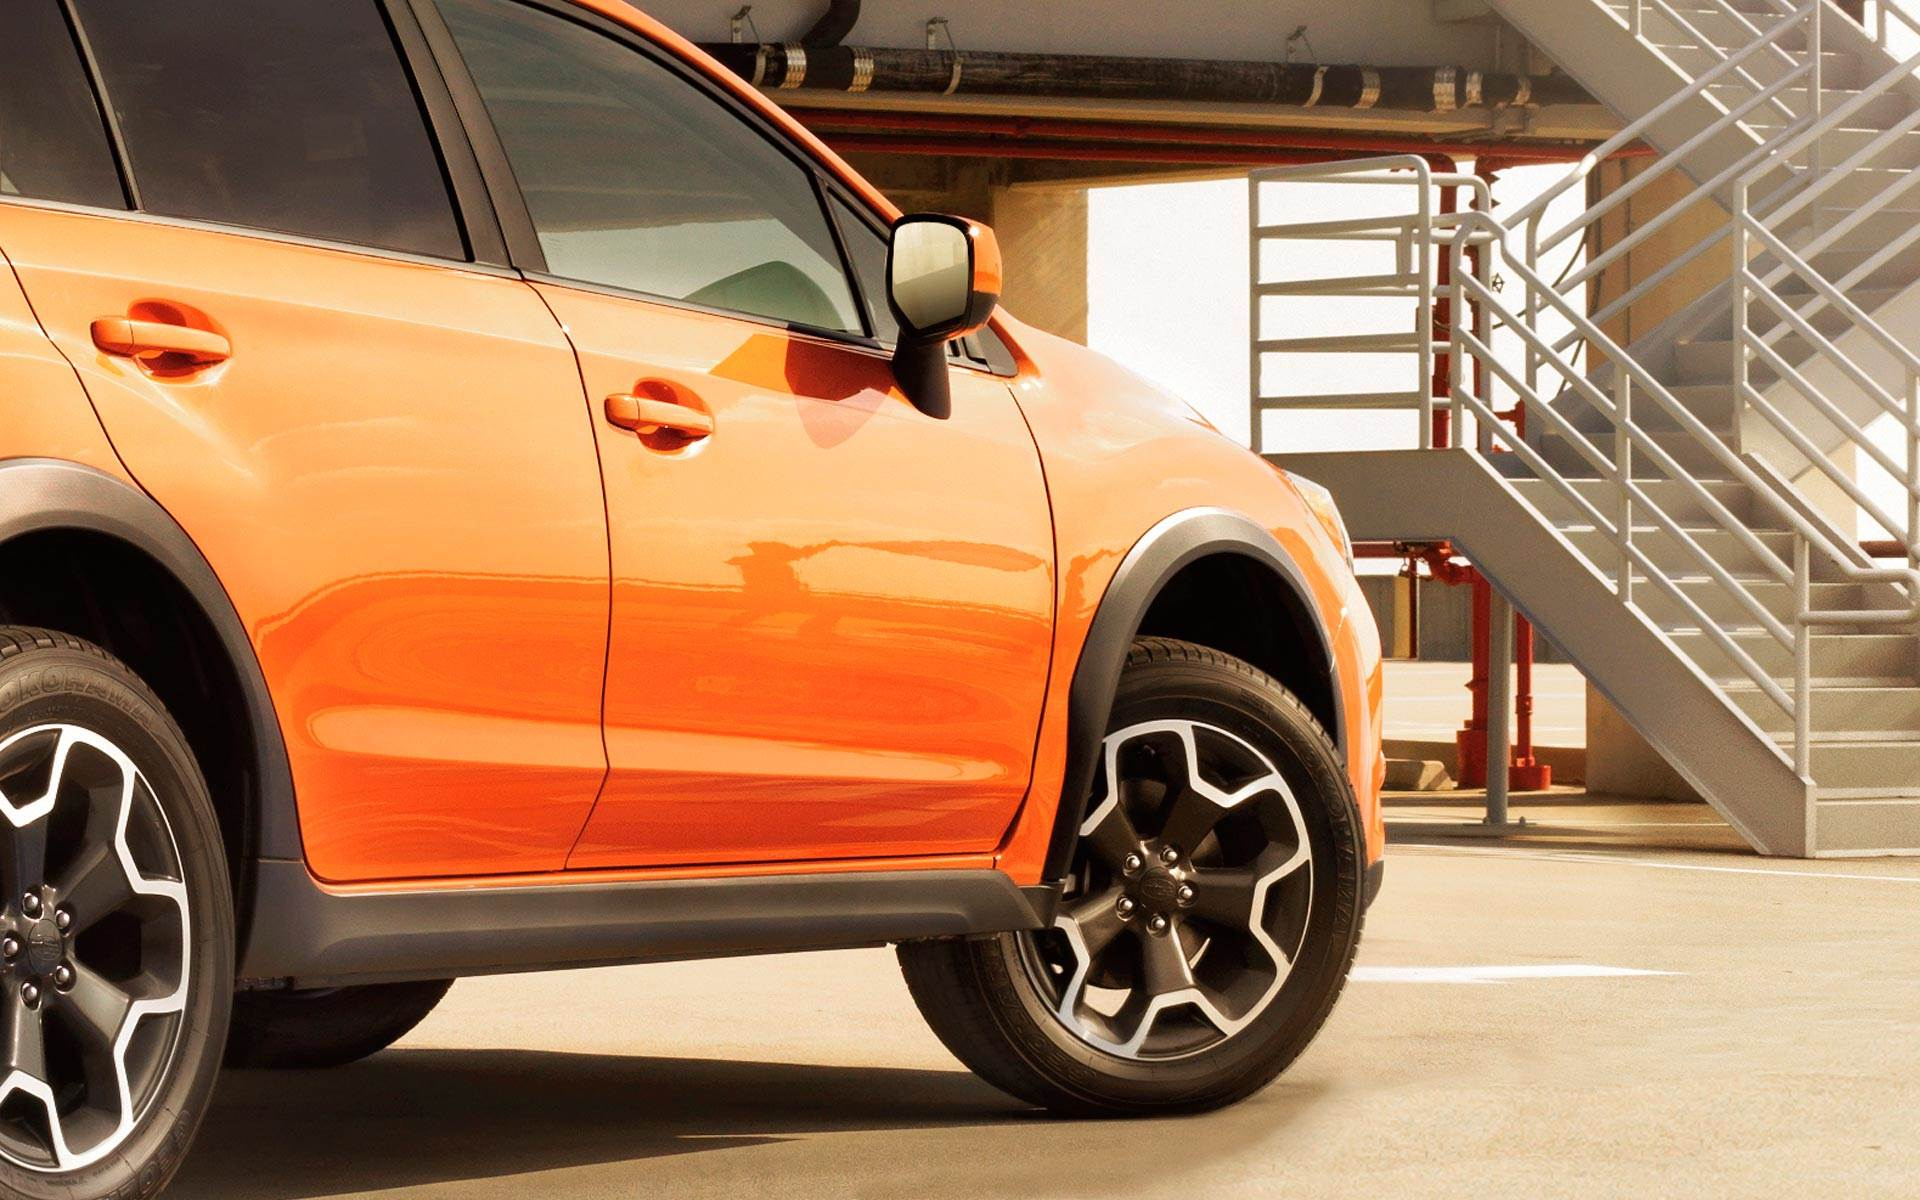 2015 Subaru XV Crosstrek Hybrid Syracuse NY Bill Rapp Subaru